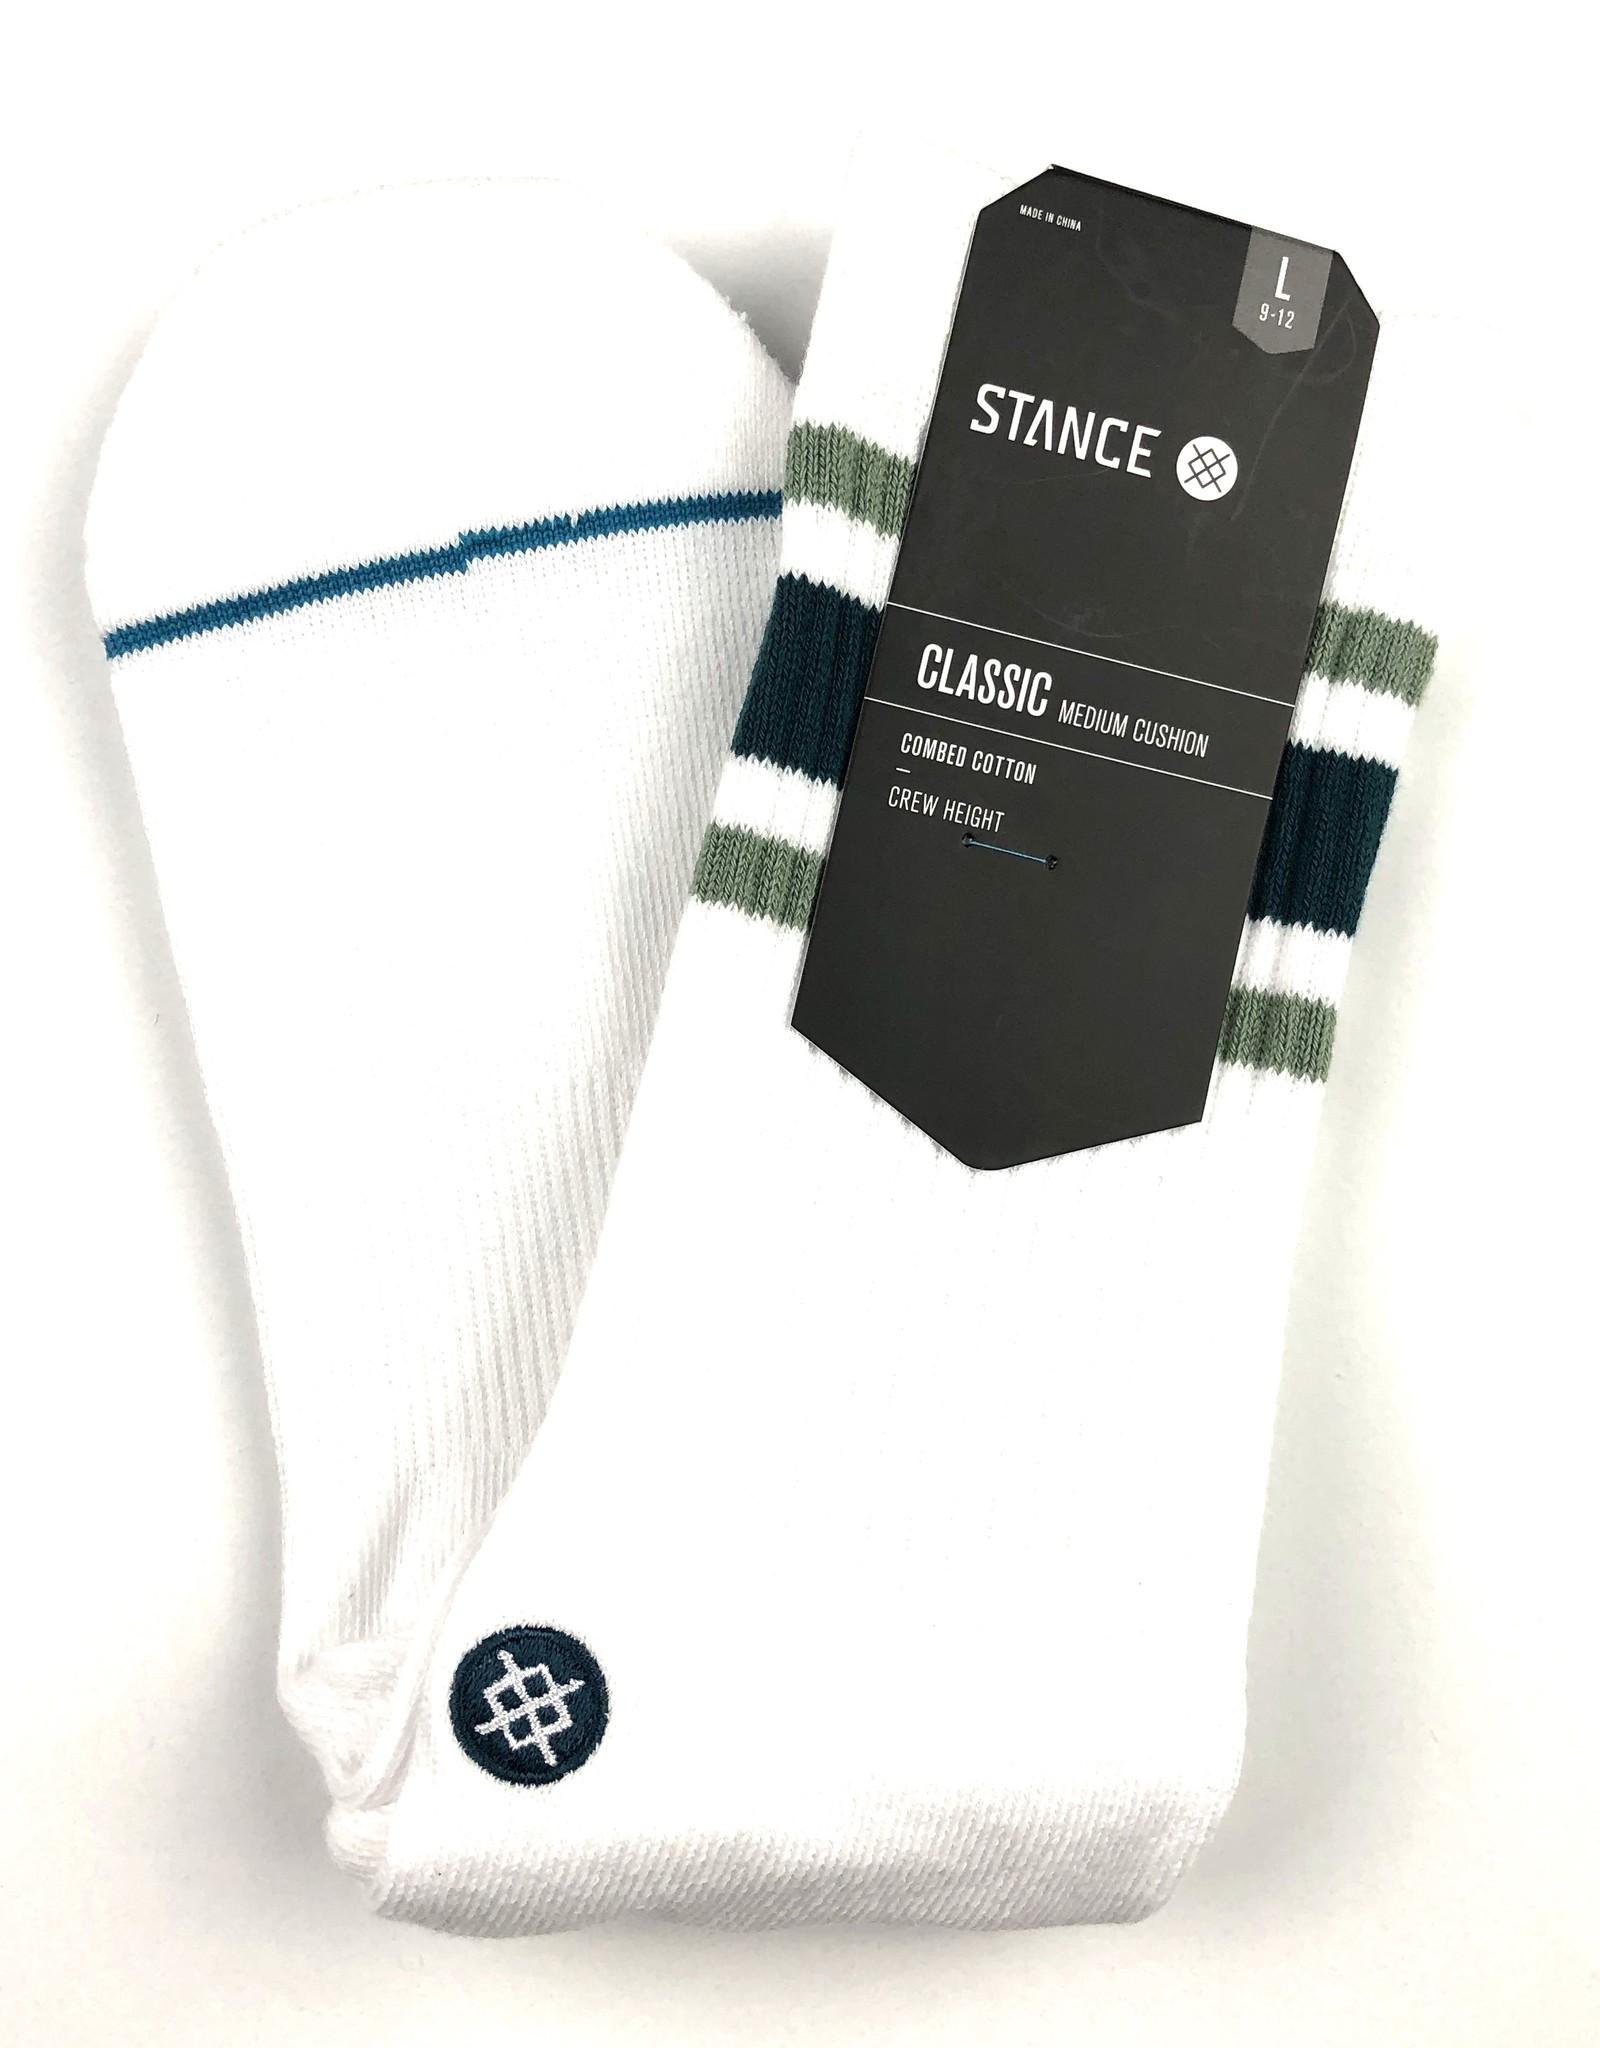 STANCE BOYD 4 SOCK - GREEN